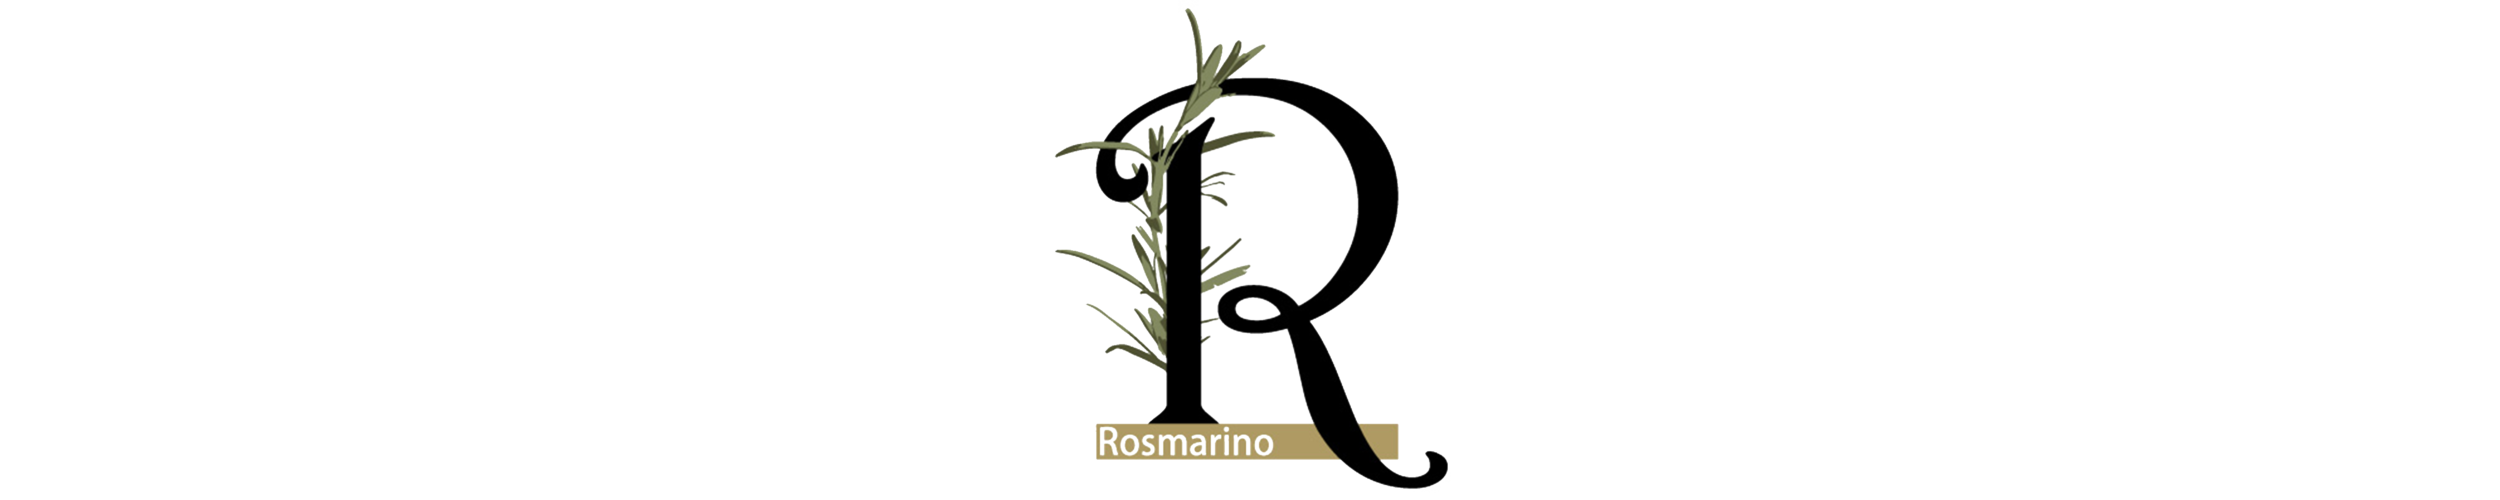 banner trans zwart restaurant rosmarino logo tablefeverkopie.png